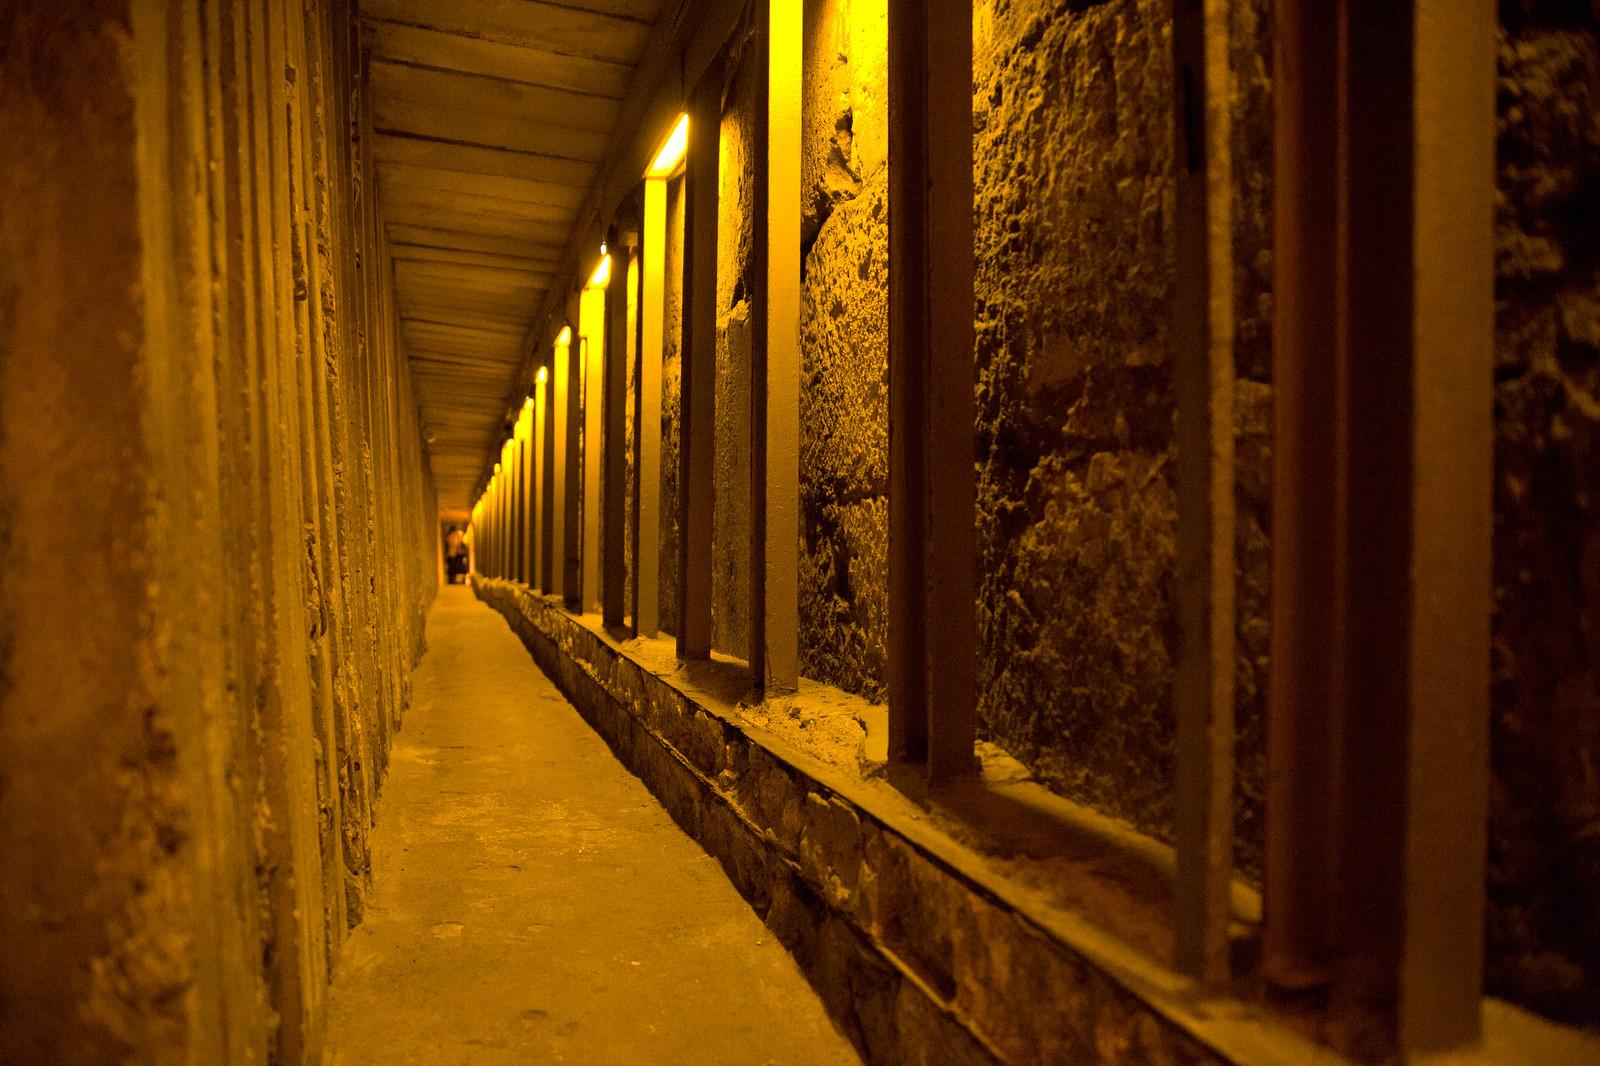 Jerusalem_Western Wall Tunnels_2_Noam Chen_IMOT